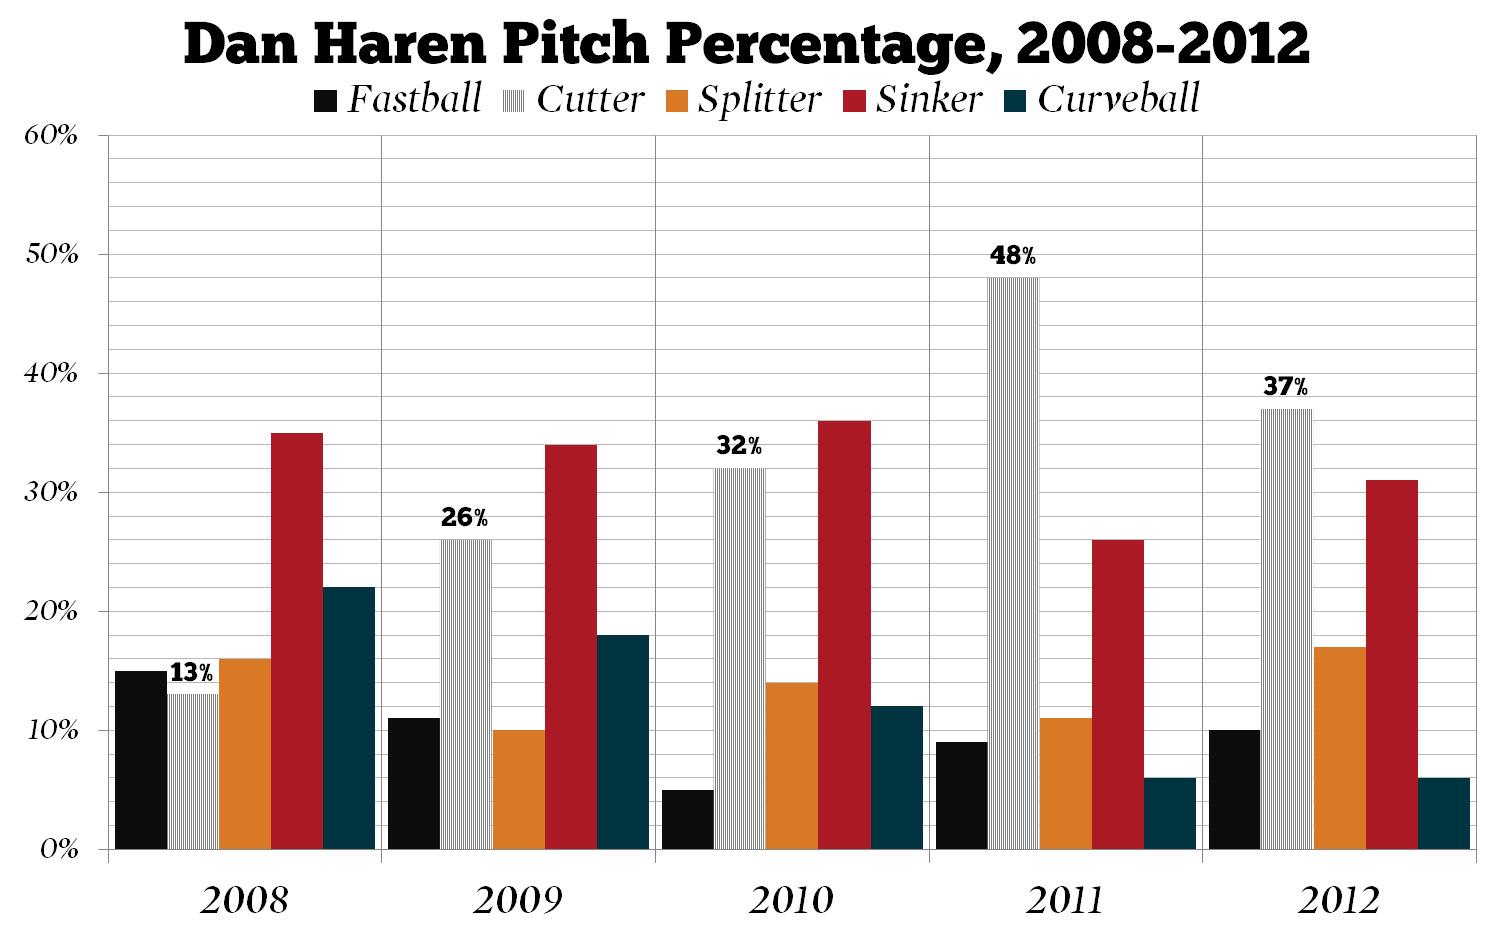 Dan_haren_pitch_percentage_medium